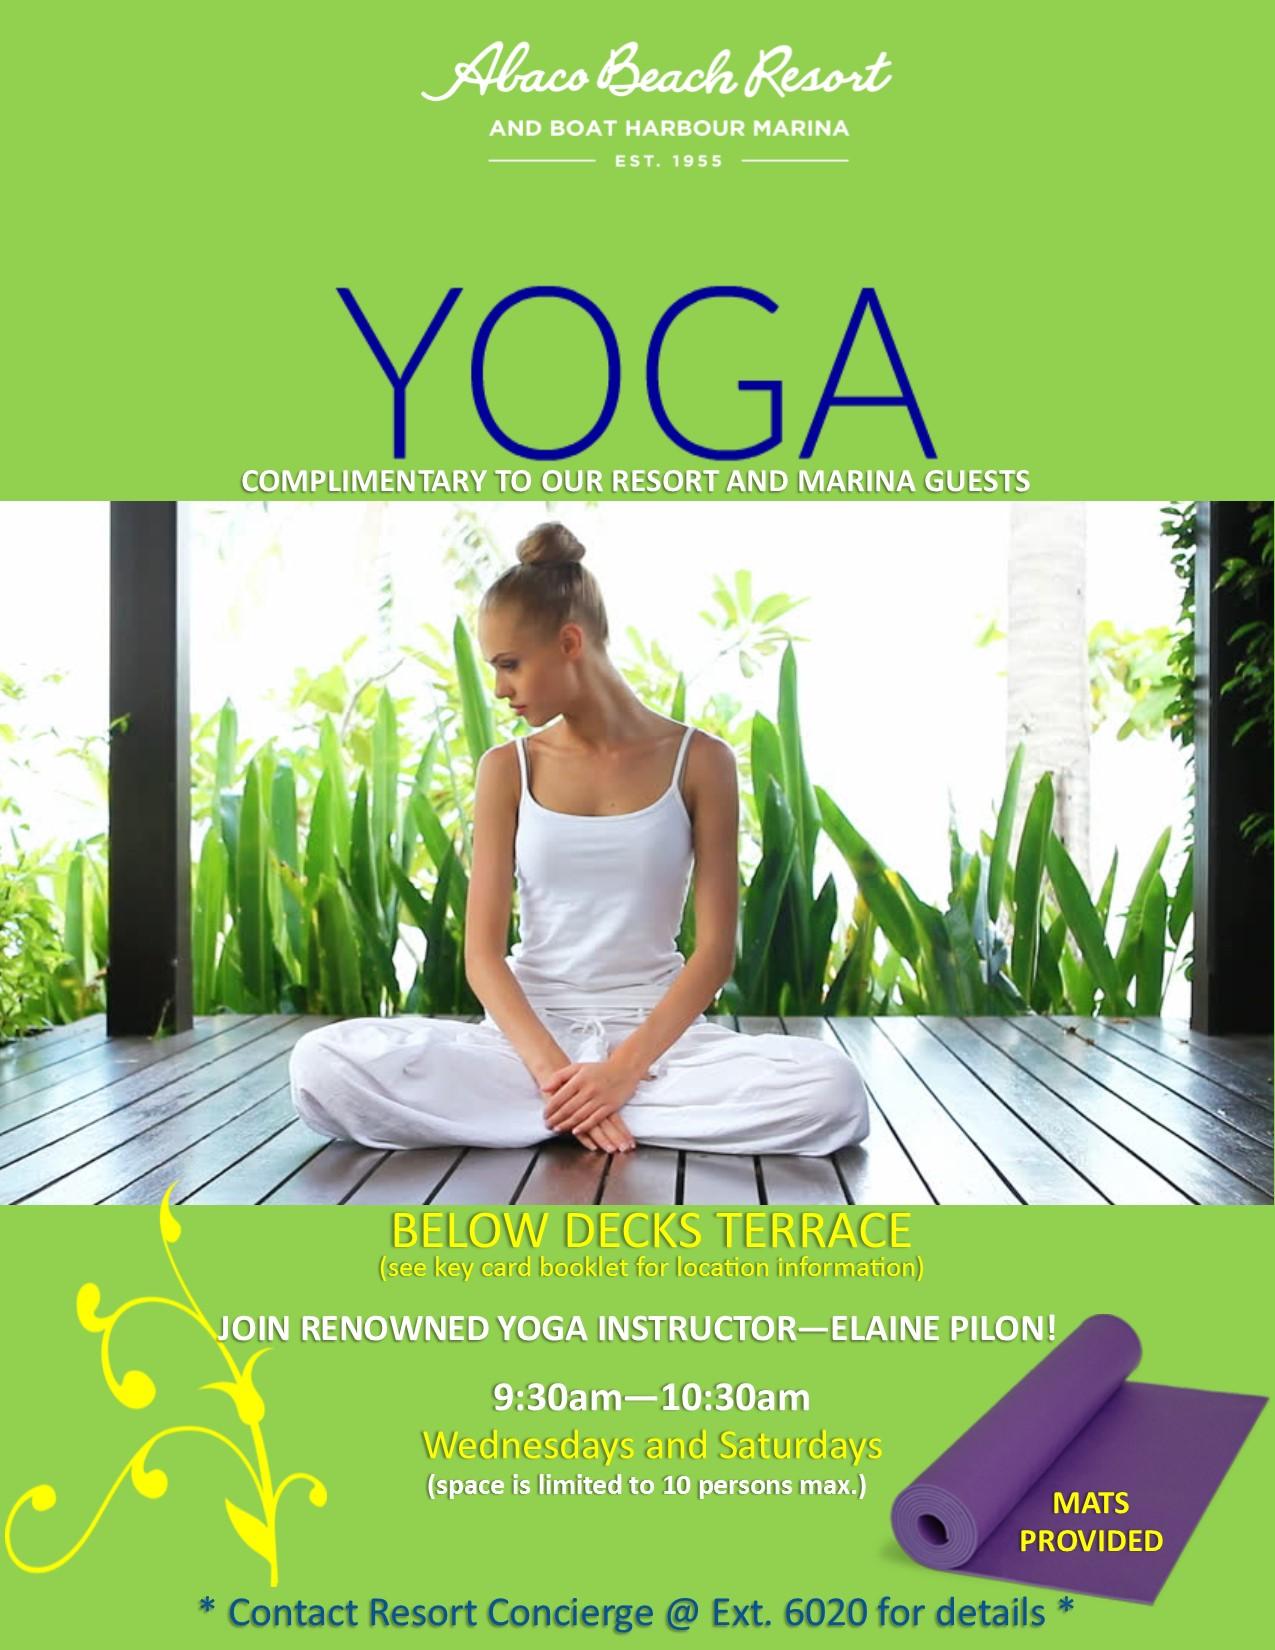 Abaco Yoga Bahamas | Abaco Beach Resort